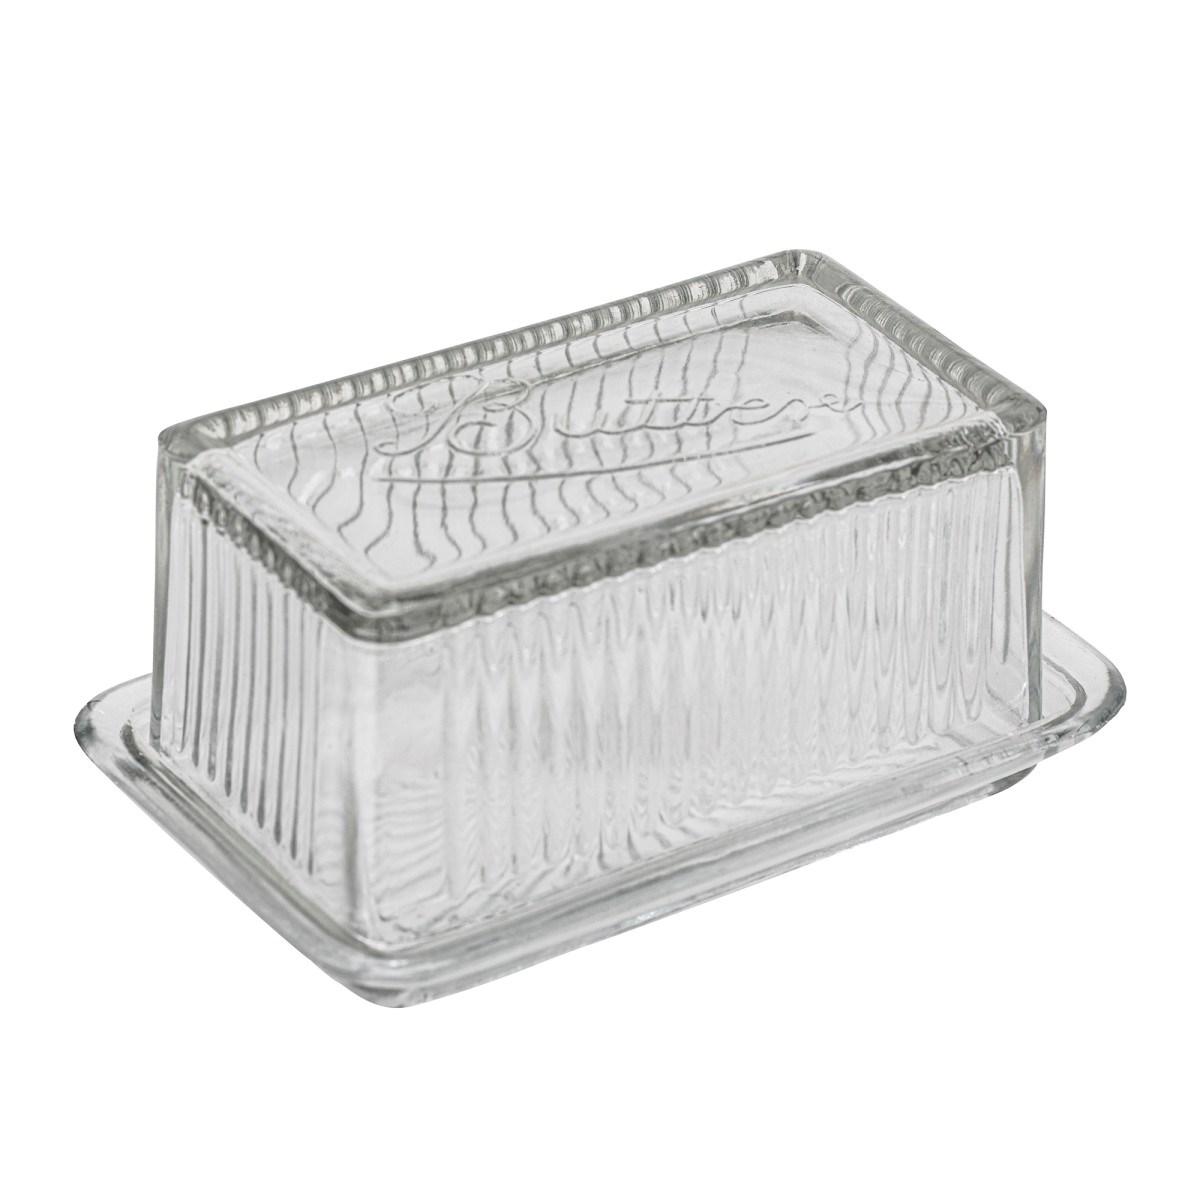 Dóza na máslo Navina z recyklovaného skla_1